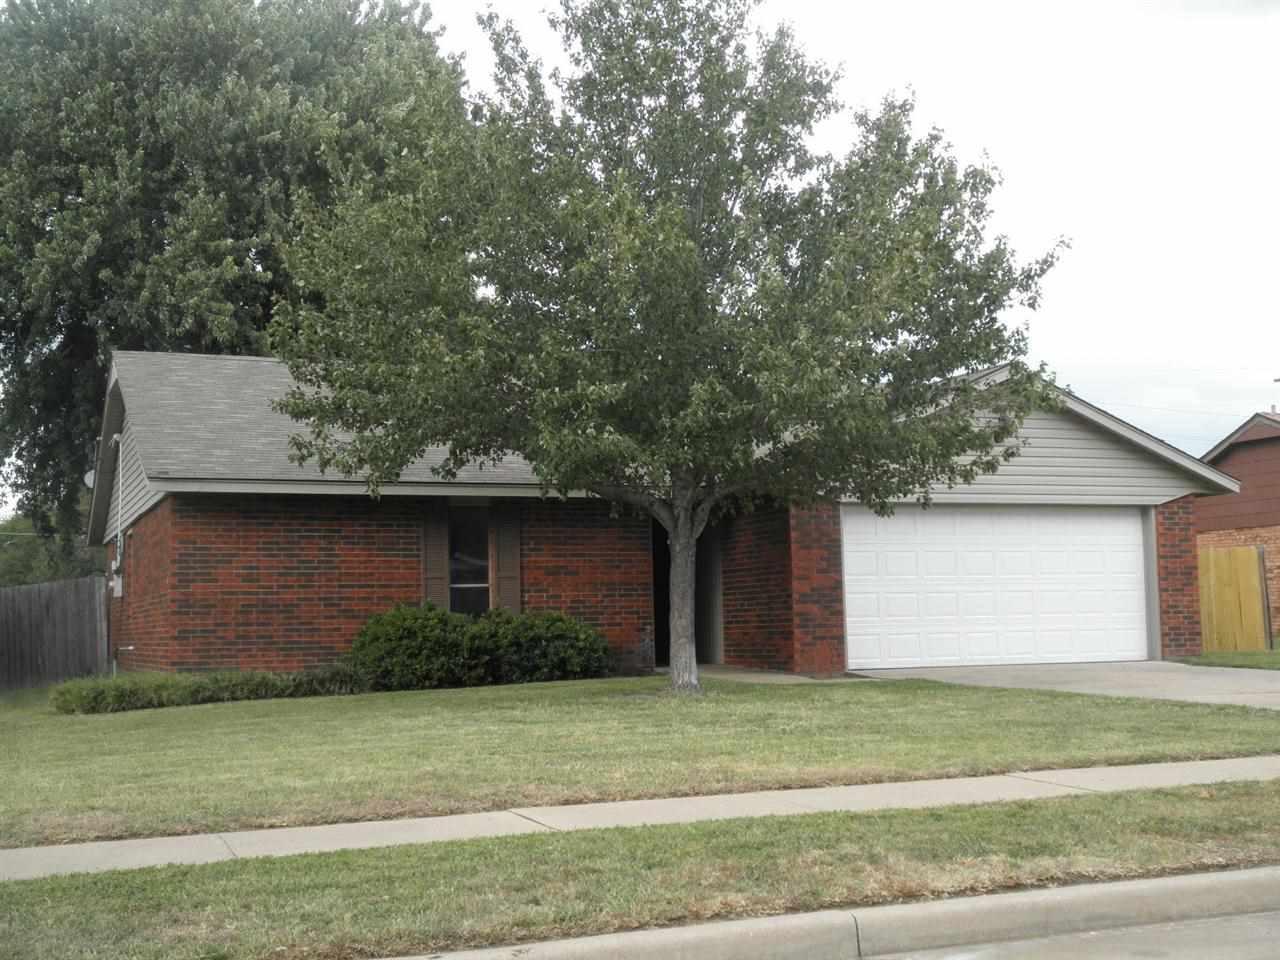 Sold Intraoffice W/MLS | 117 Woodbury  Ponca City, OK 74601 0